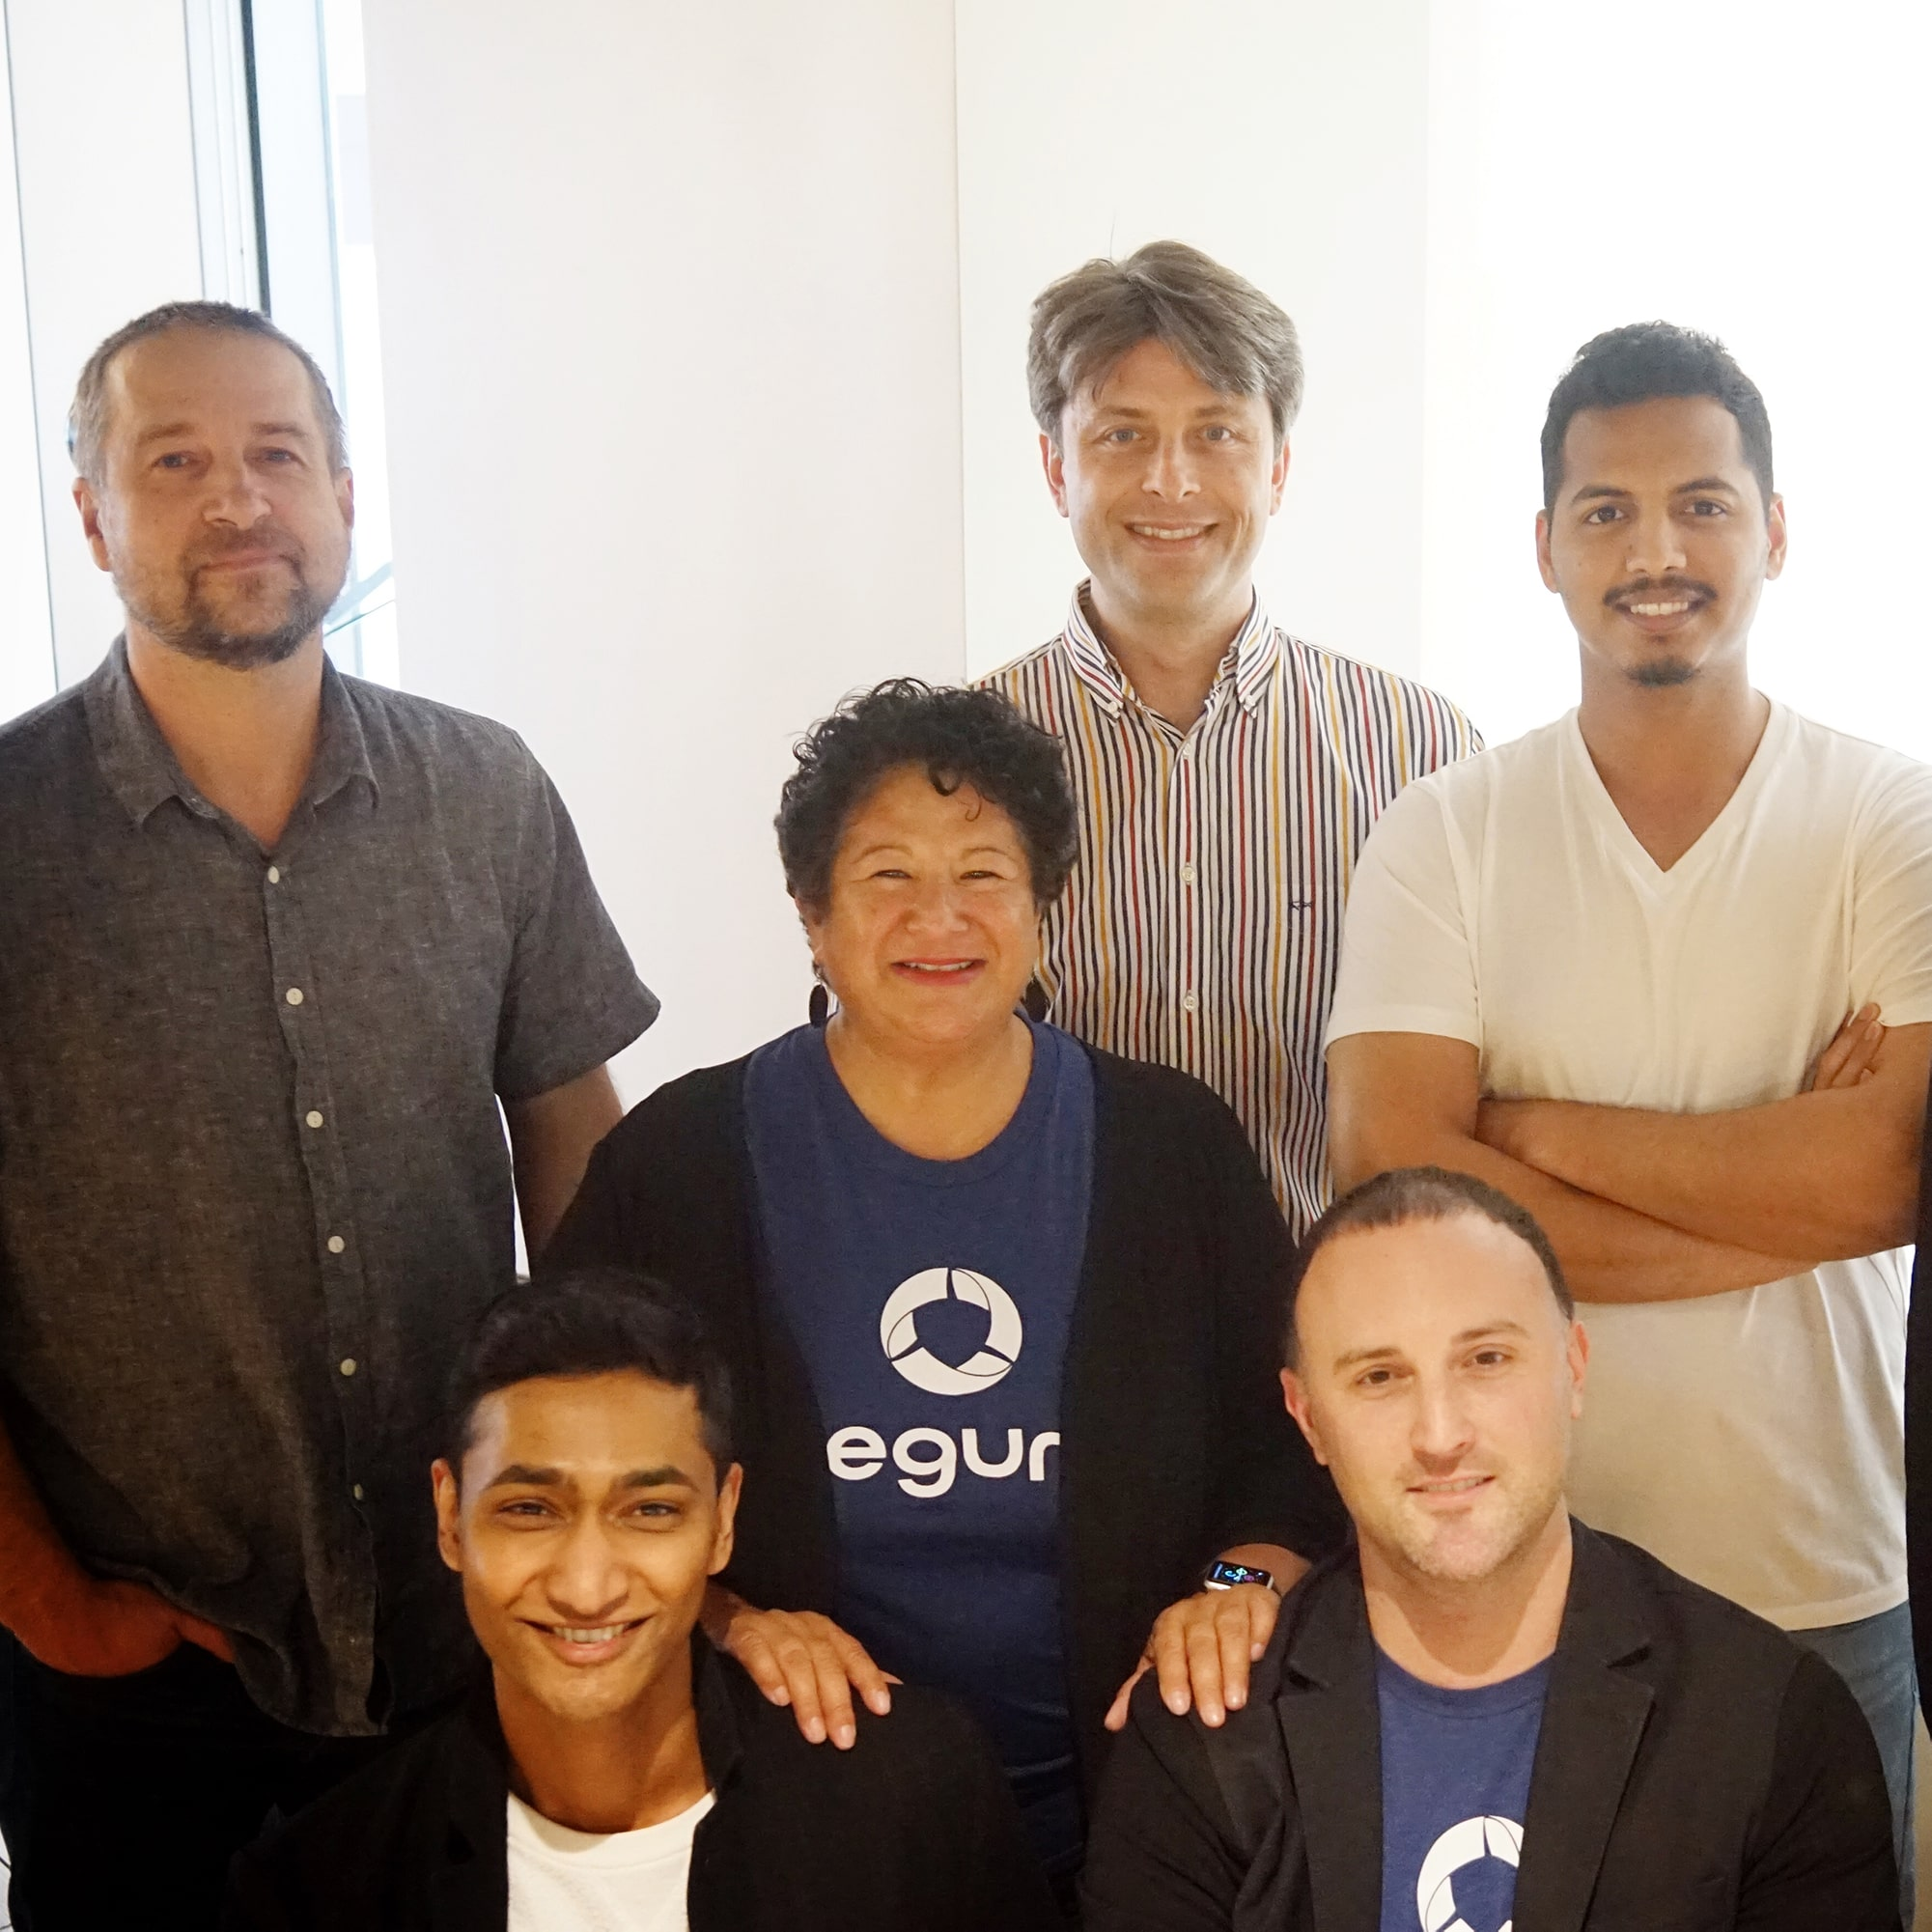 Team Zeguro